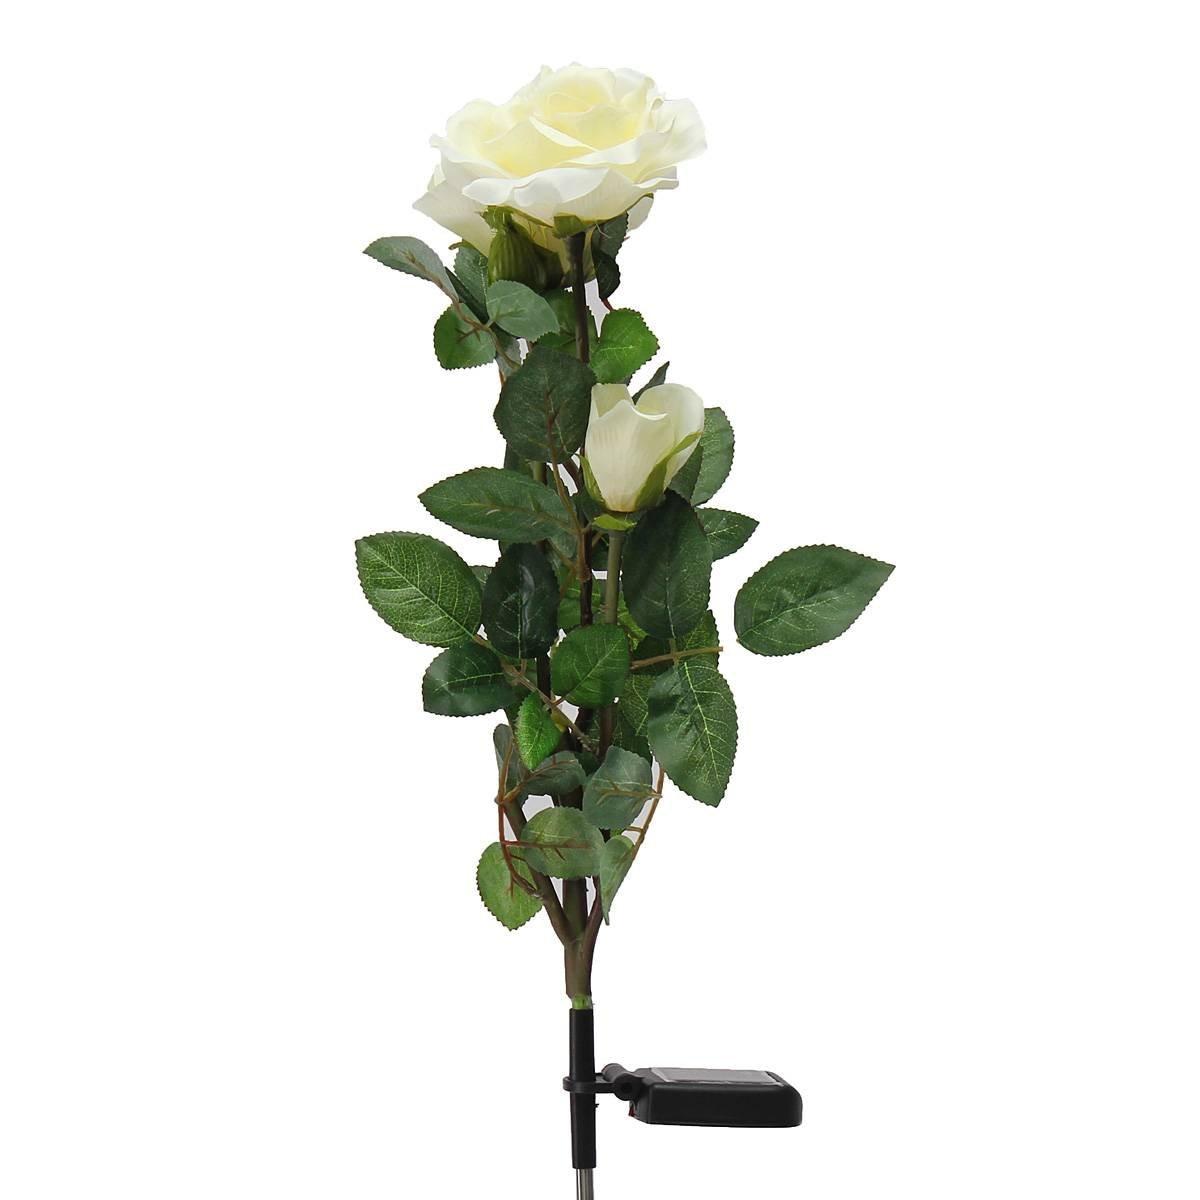 Solar Powered White 3 LED Rose Flower Lights Garden Outdoor Decorative Decor Landscape Rose Light Path Lamp